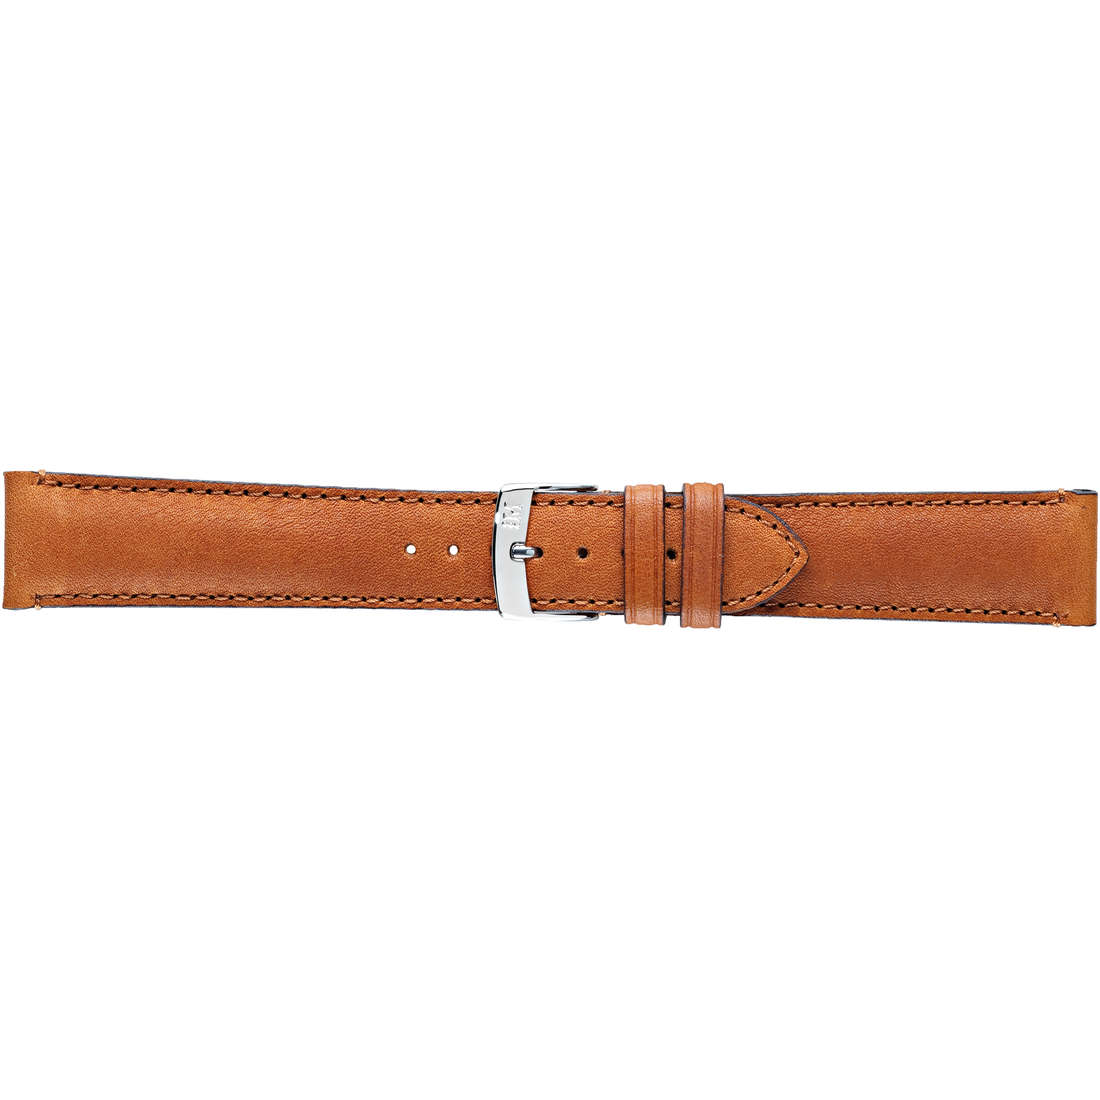 watch watch bands watch straps man Morellato Manufatti A01U3884A61044CR22